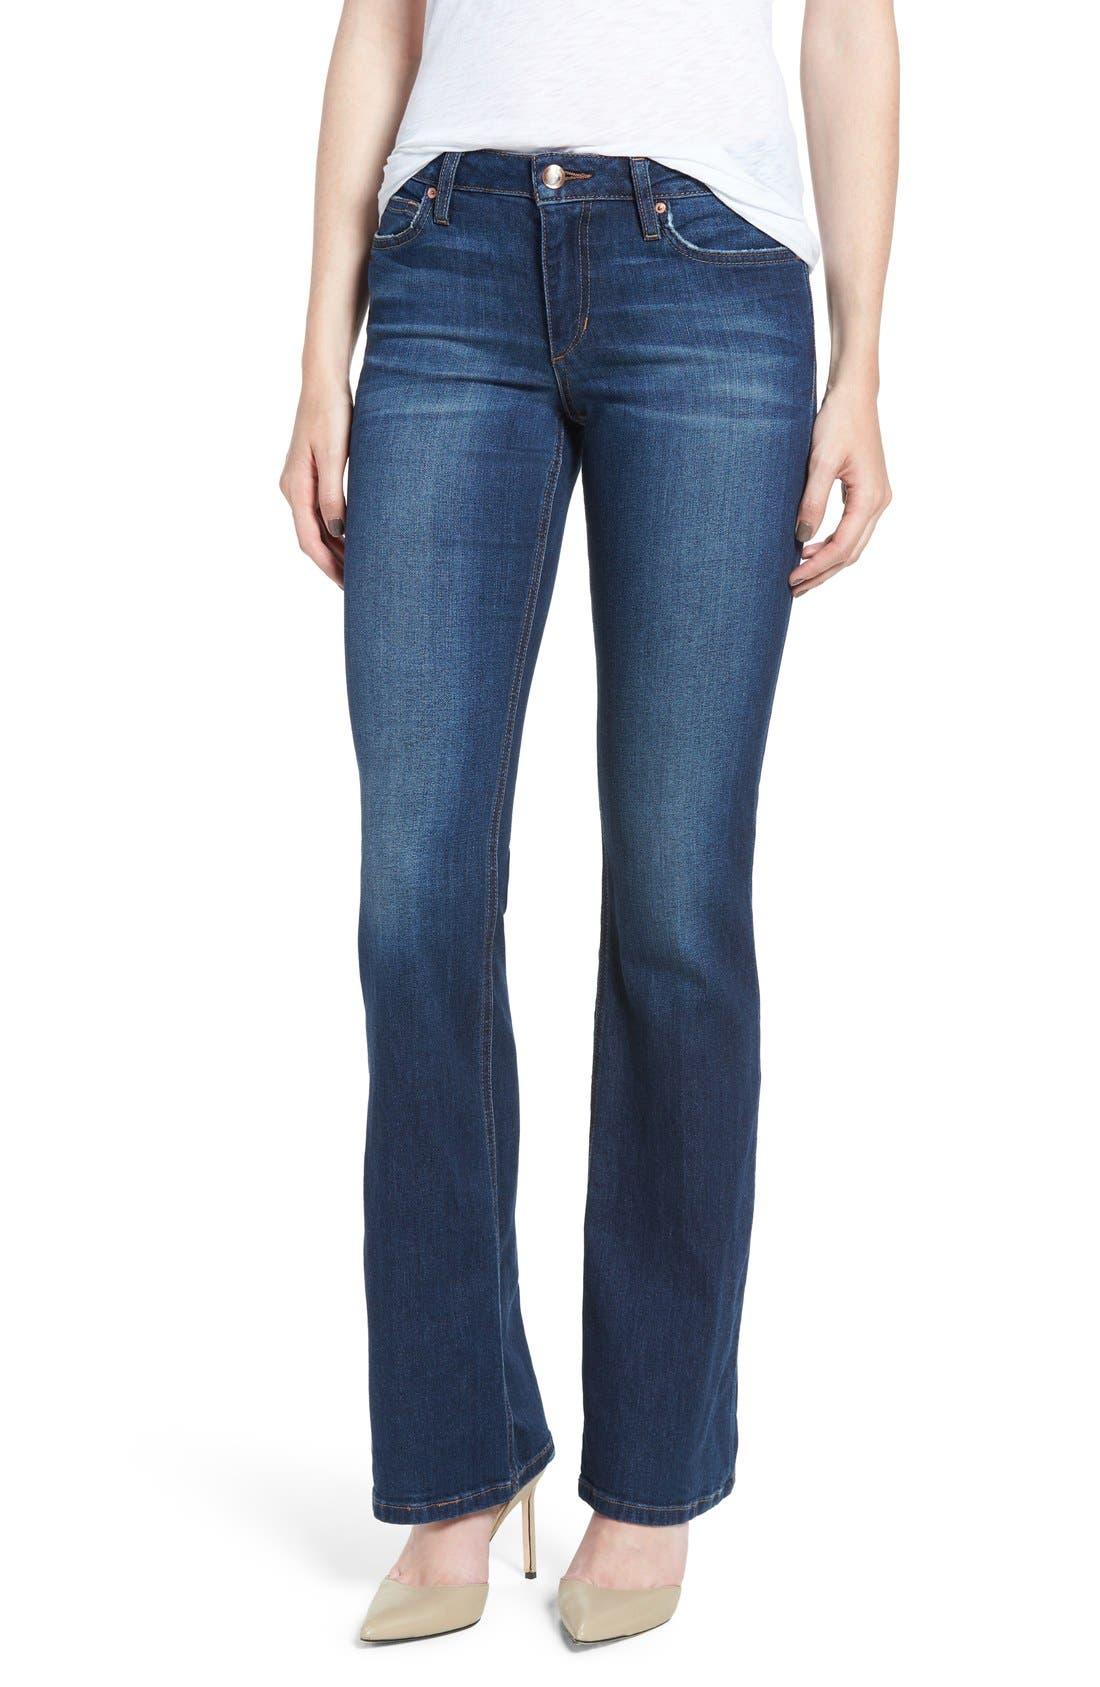 Alternate Image 1 Selected - Joe's 'Flawless - Honey' Curvy Bootcut Jeans (Lyla)